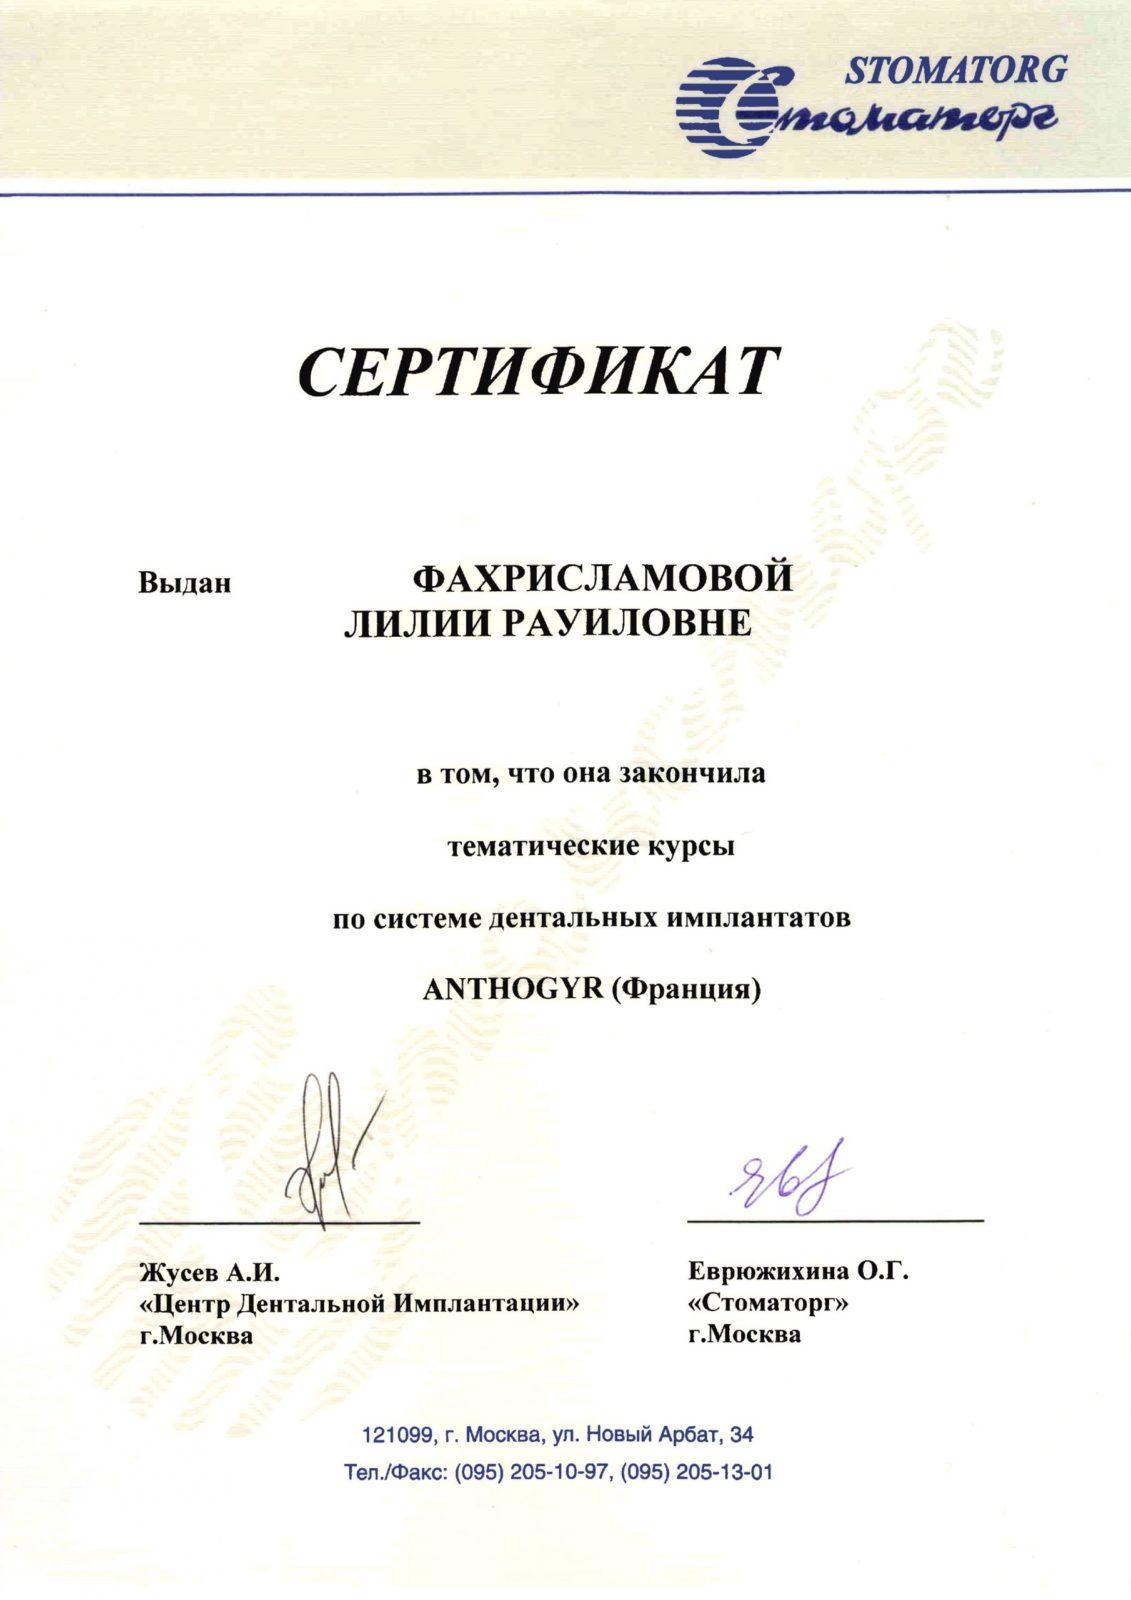 http://oris-vidnoe.ru/wp-content/uploads/2021/05/11-scaled.jpeg